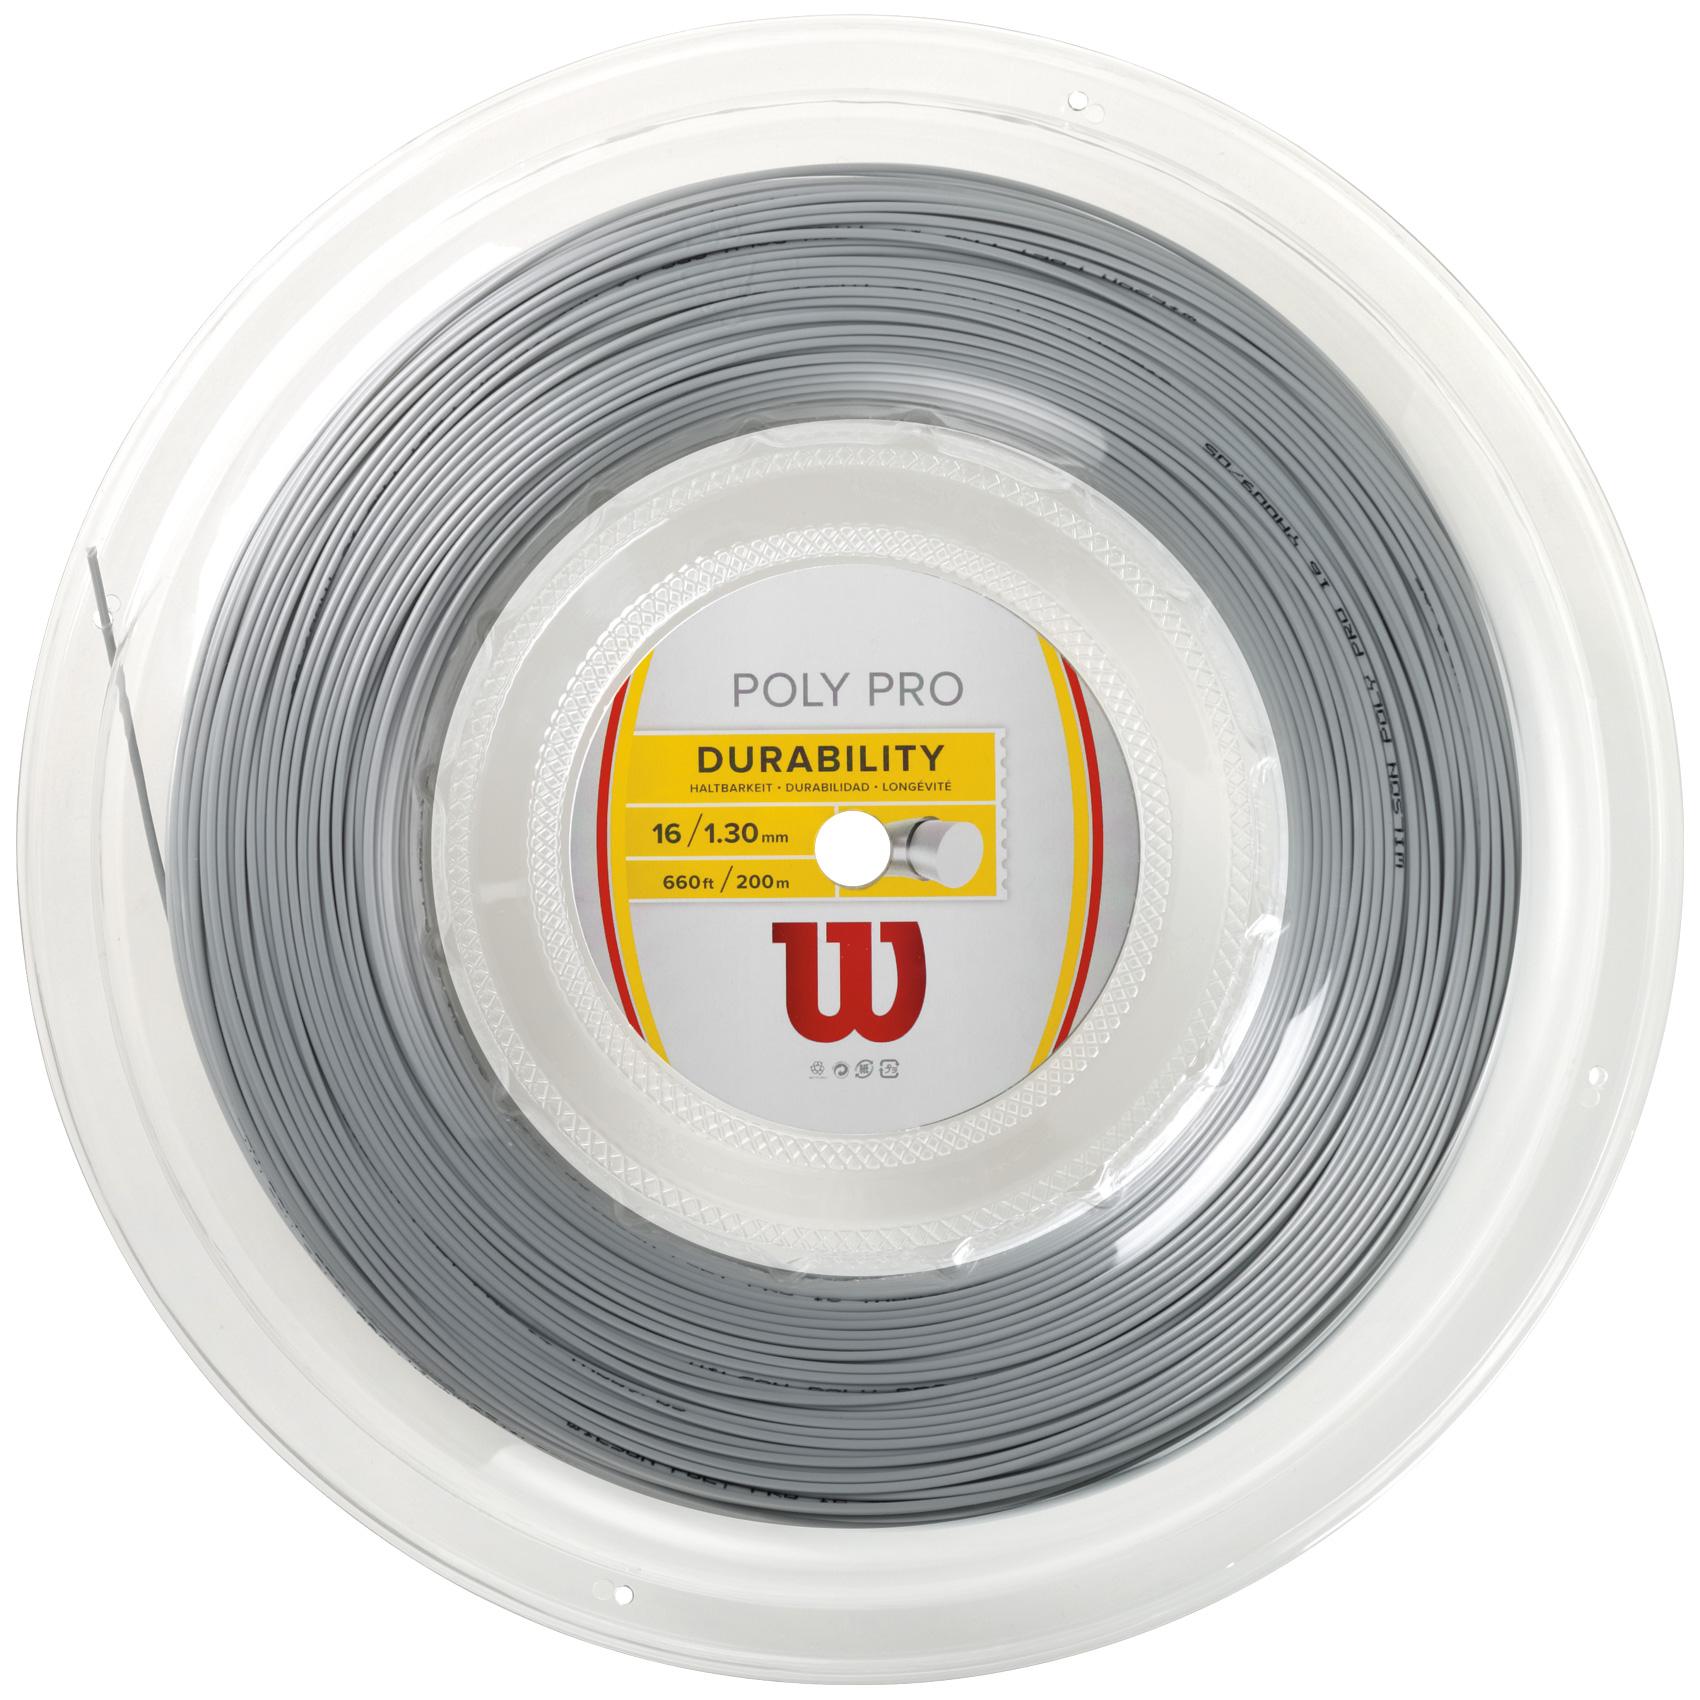 Wilson Durability Poly Pro Tennis String - 200m Reel - 1.30mm